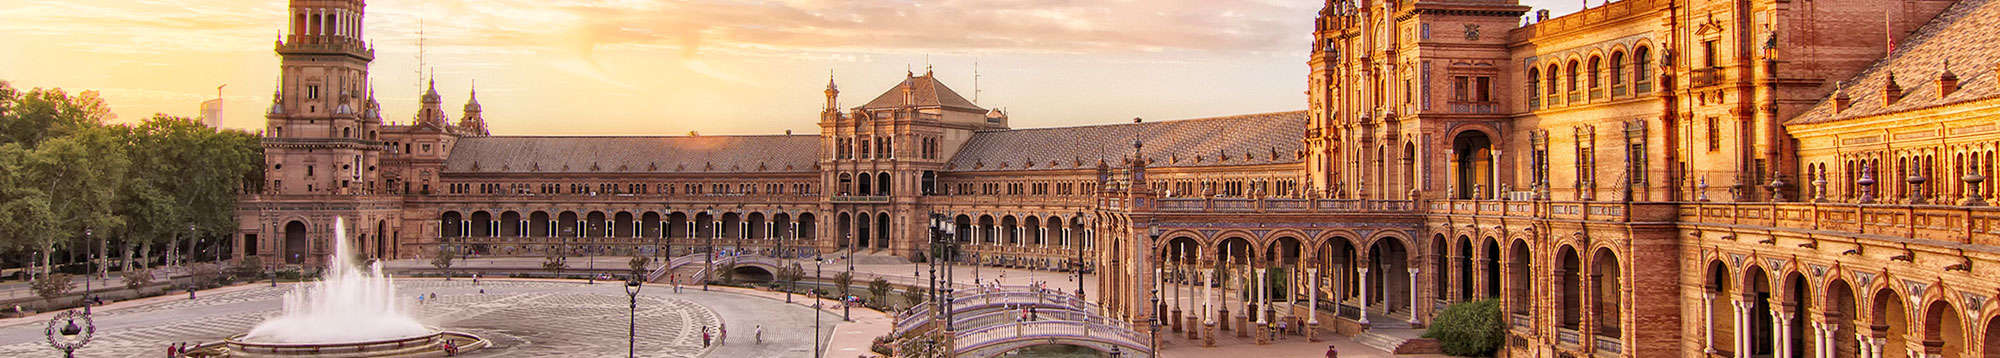 Escapadas fin de semana  en ciudades monumentales en Zaragoza